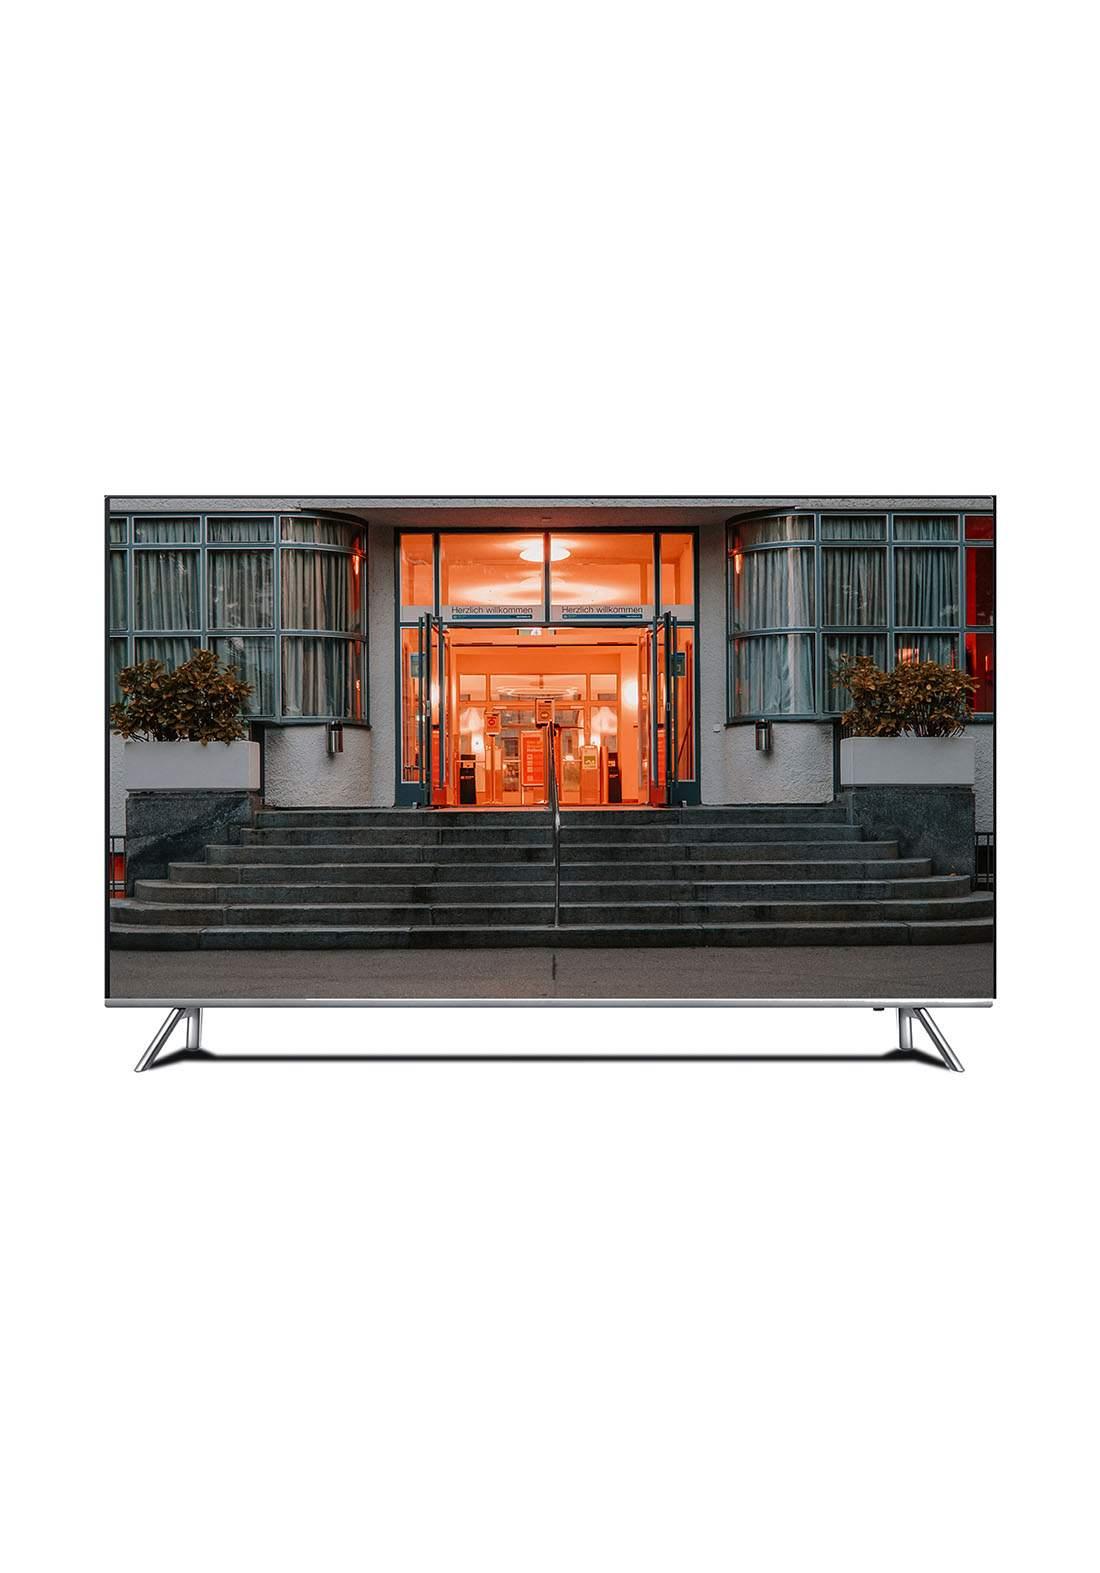 Shark Smart Led Tv - 50inch 4K شاشة ذكية